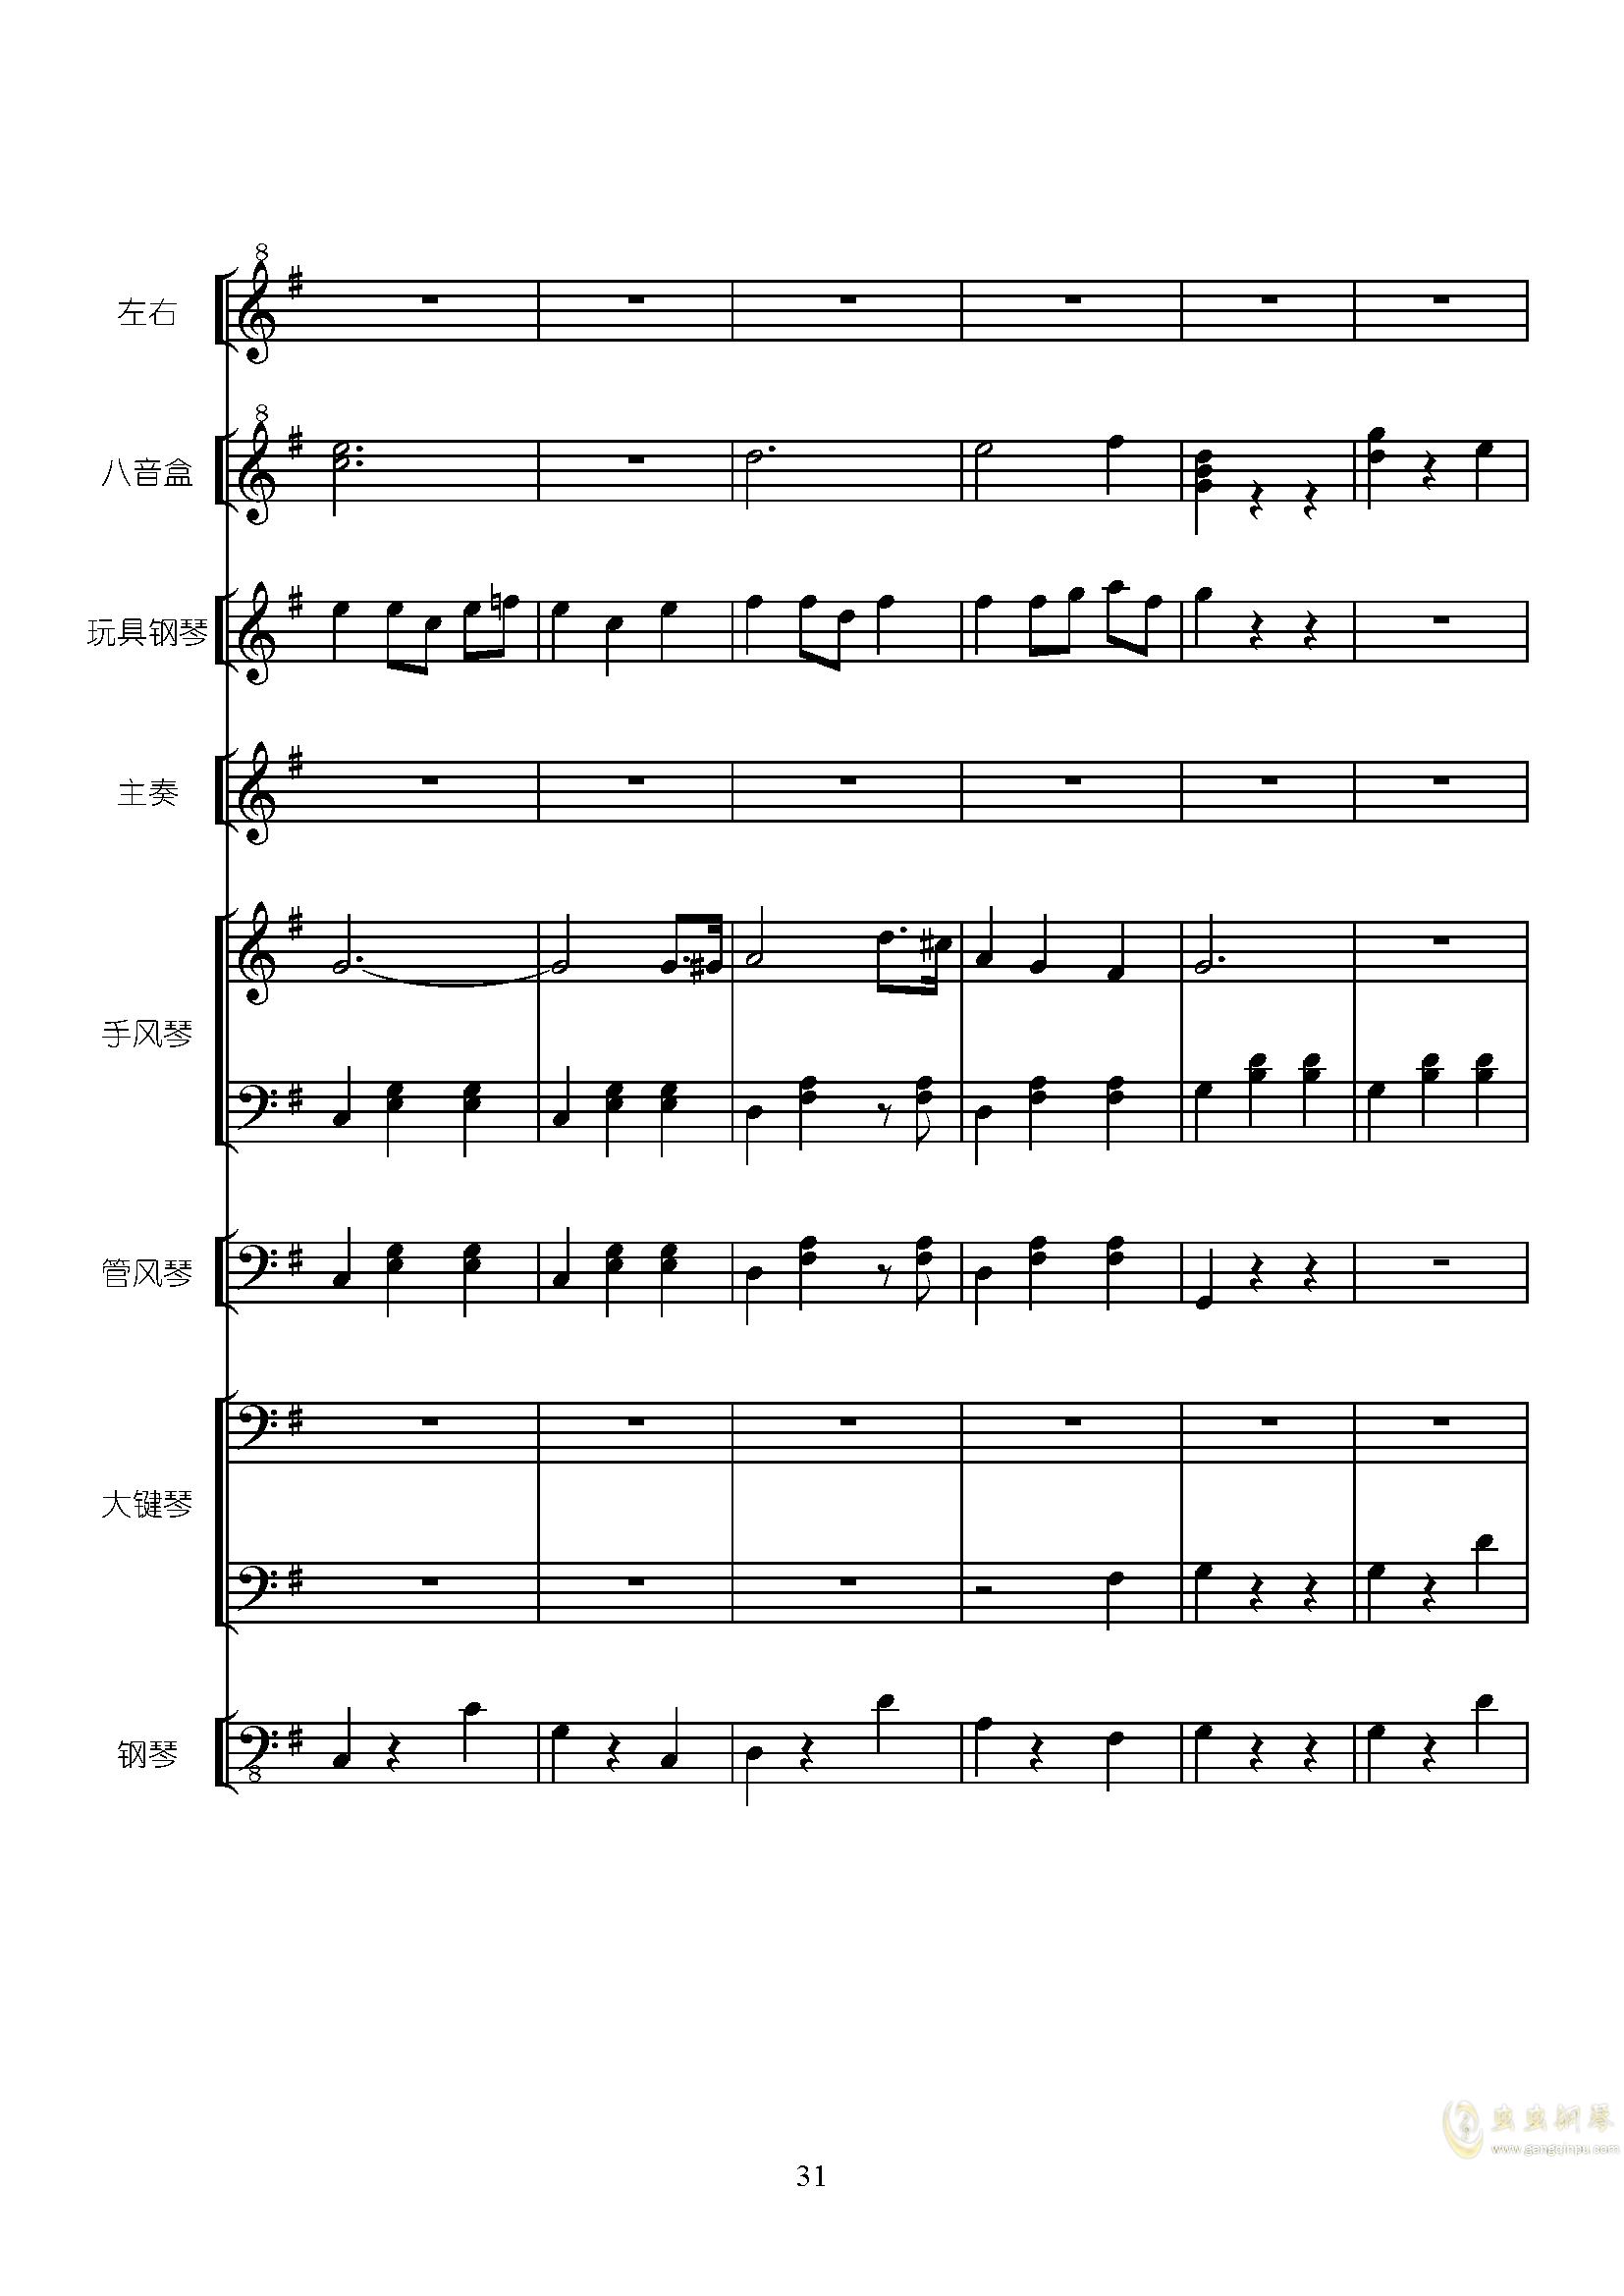 RainBowRain钢琴谱 第31页